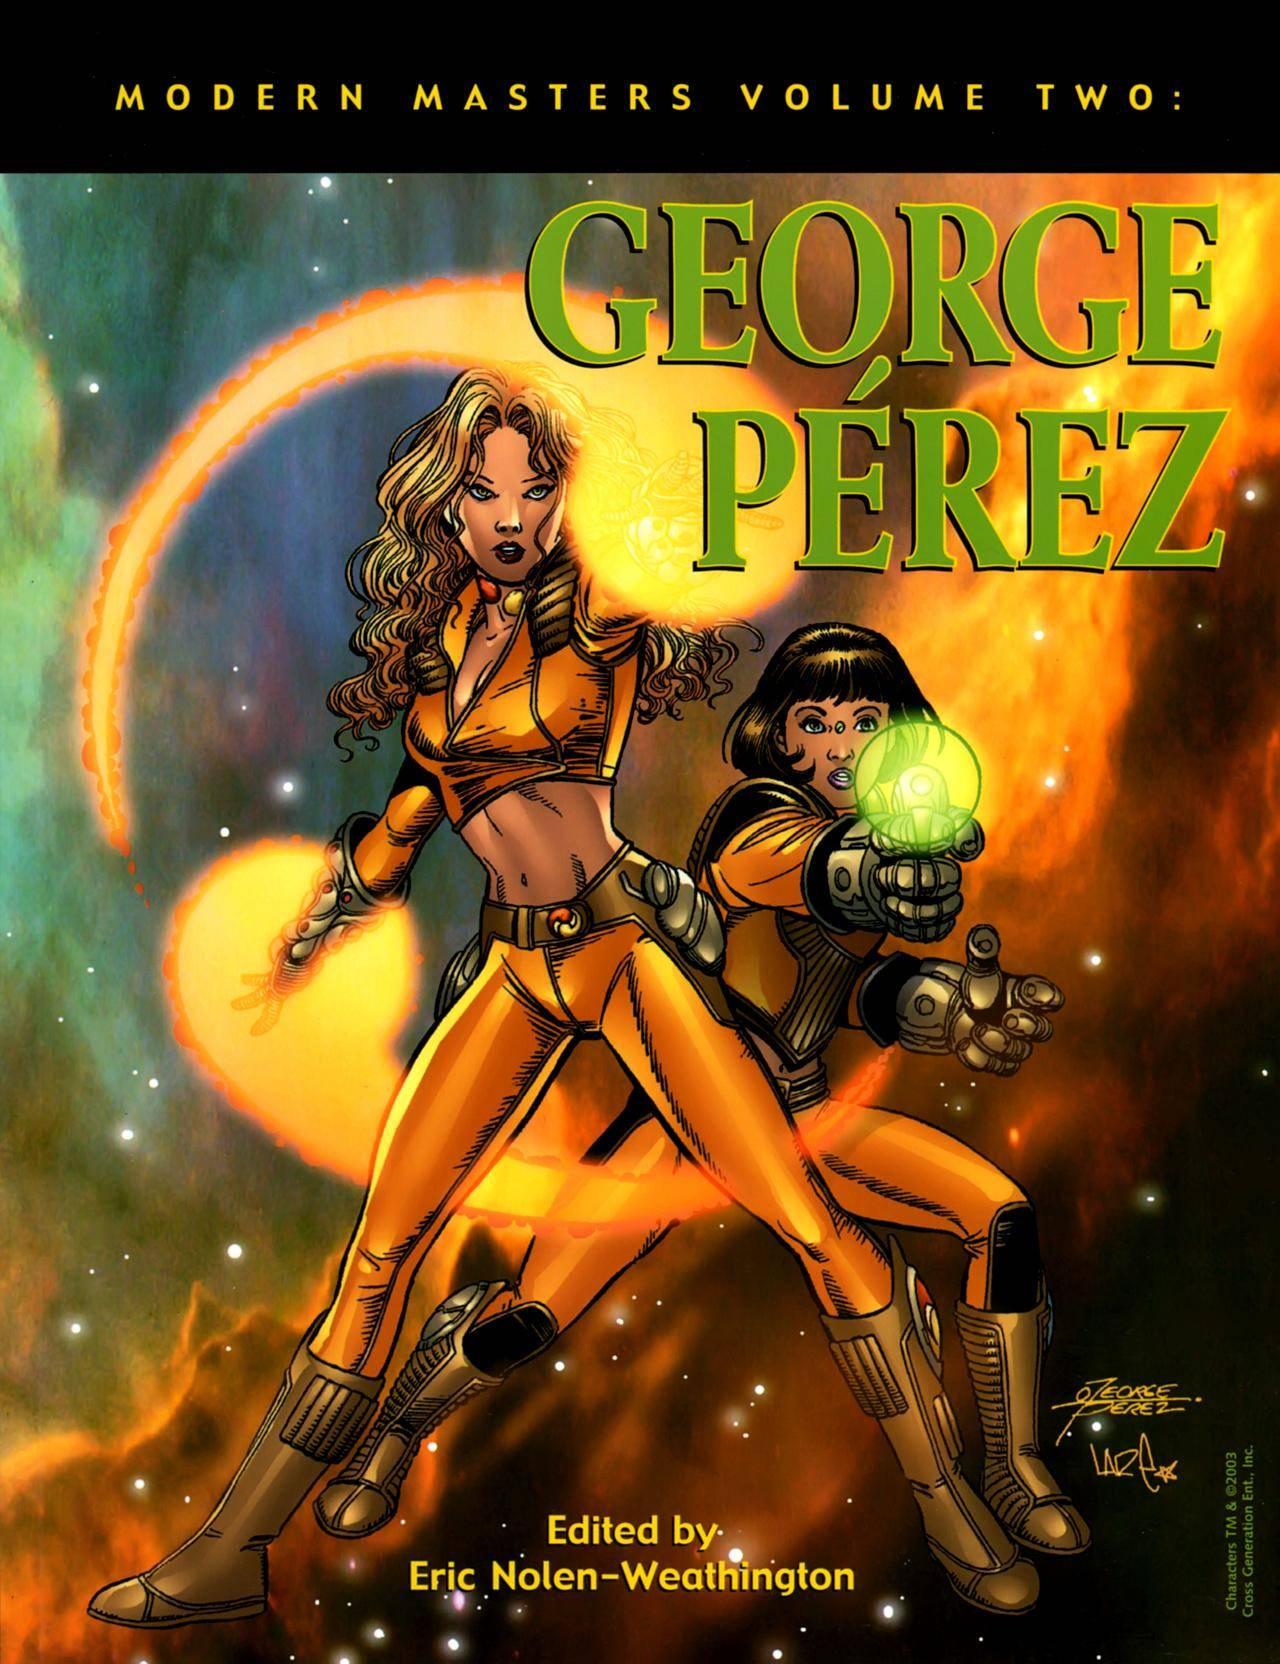 Modern Masters Vol 02 - George Perez ArtNet - DCP